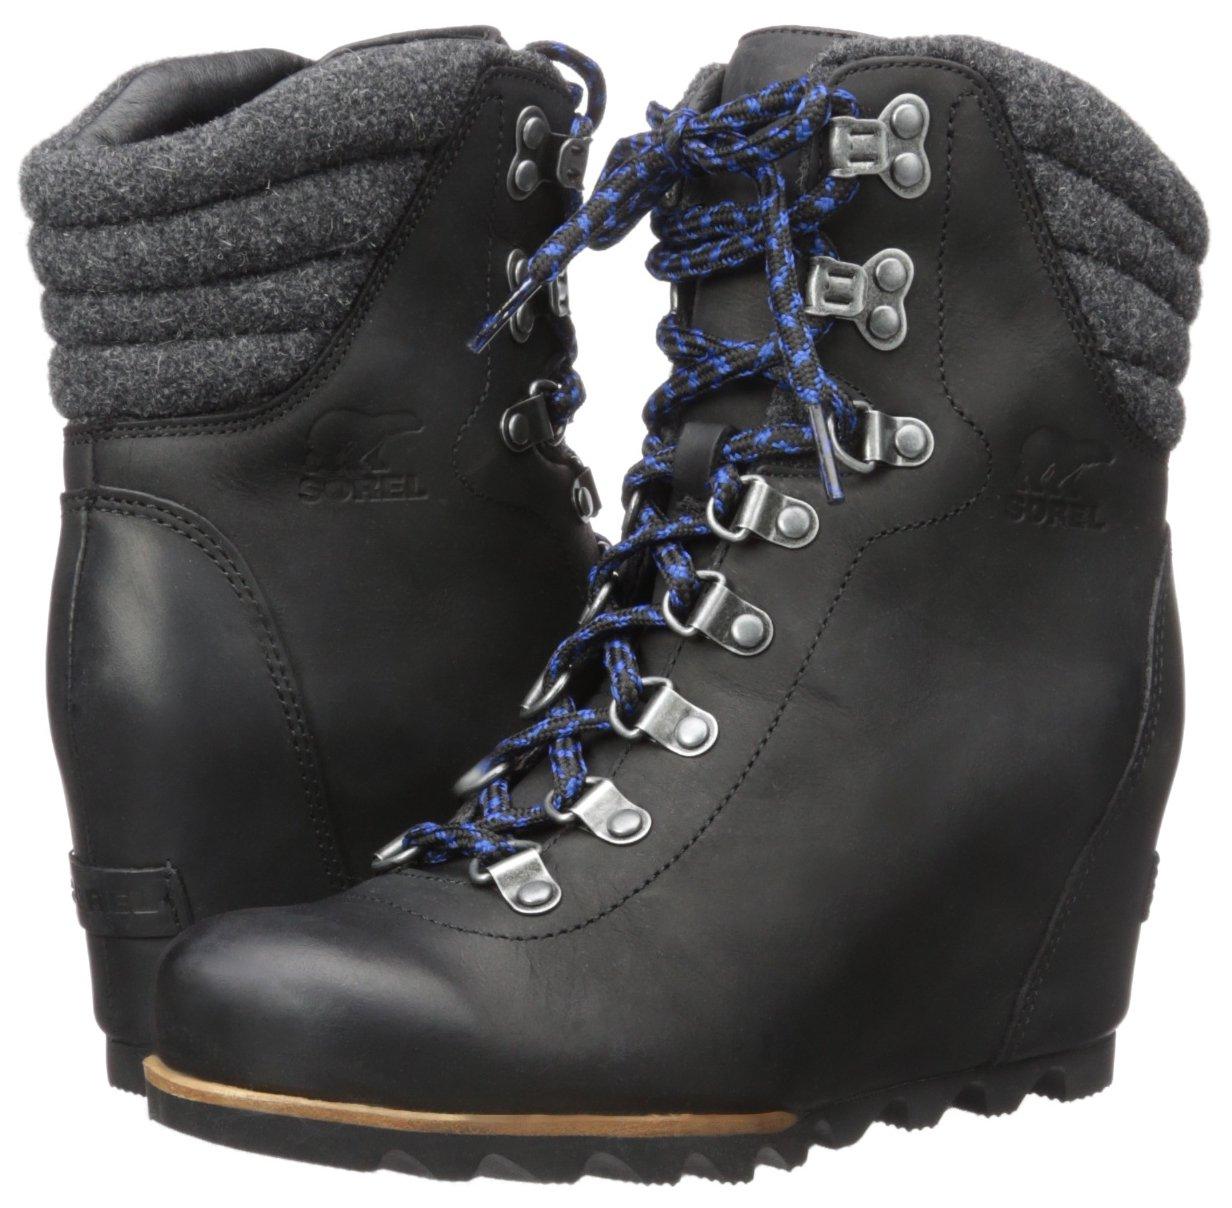 SOREL Women's Conquest Wedge Mid Calf Boot, Black, 11 M US by SOREL (Image #6)